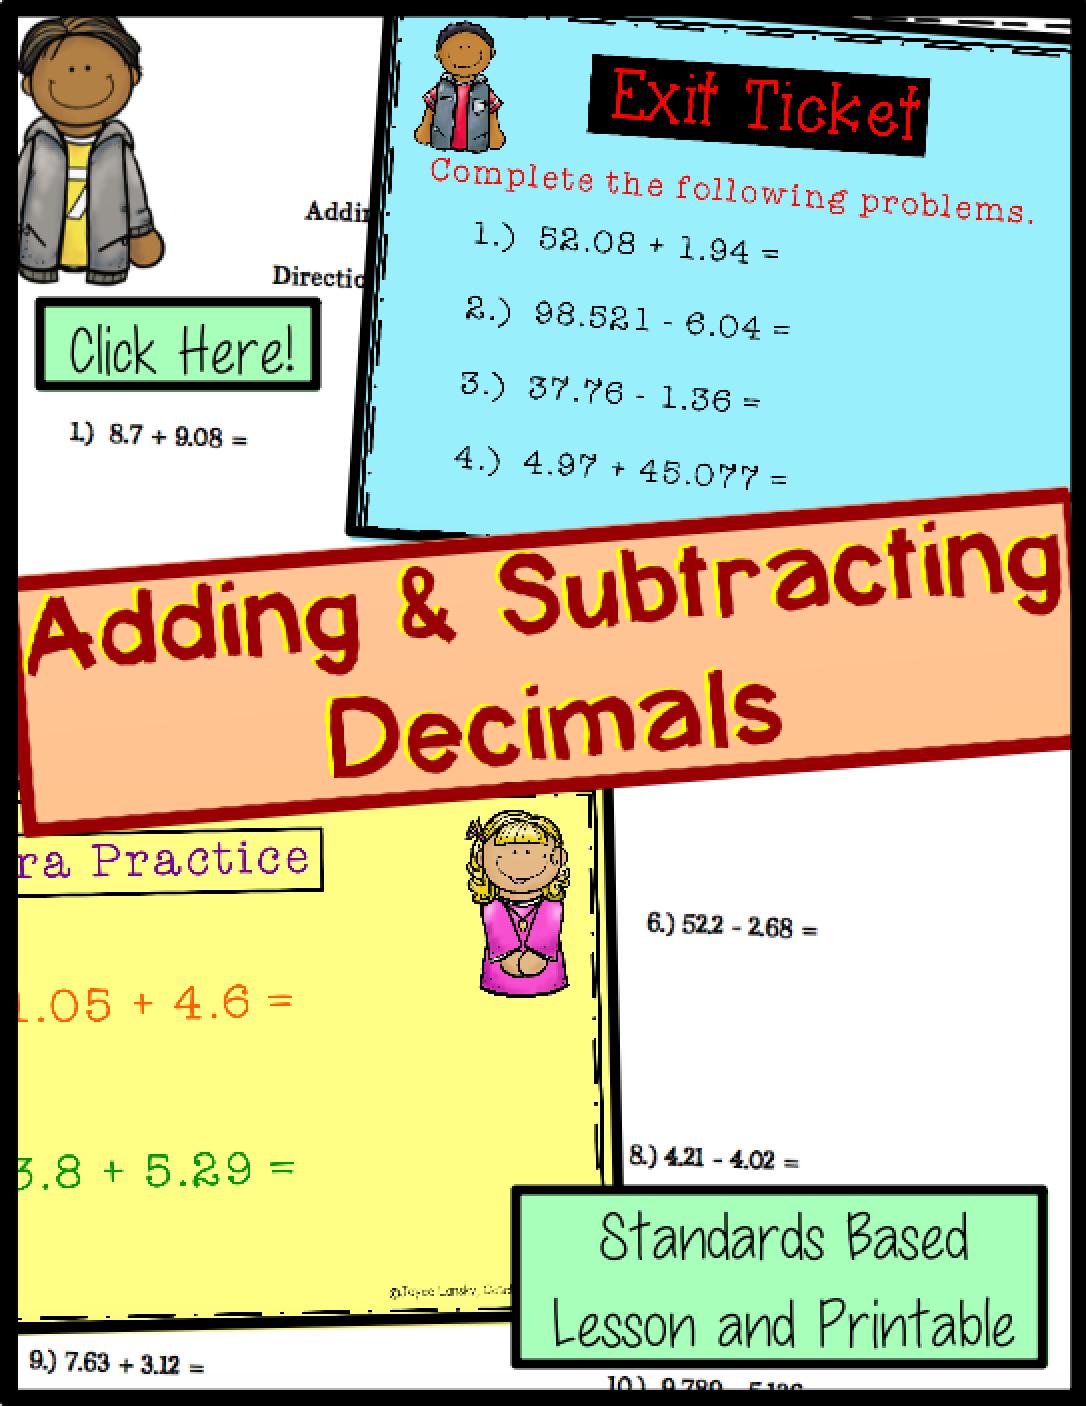 Adding Amp Subtracting Decimals For Promethean Board